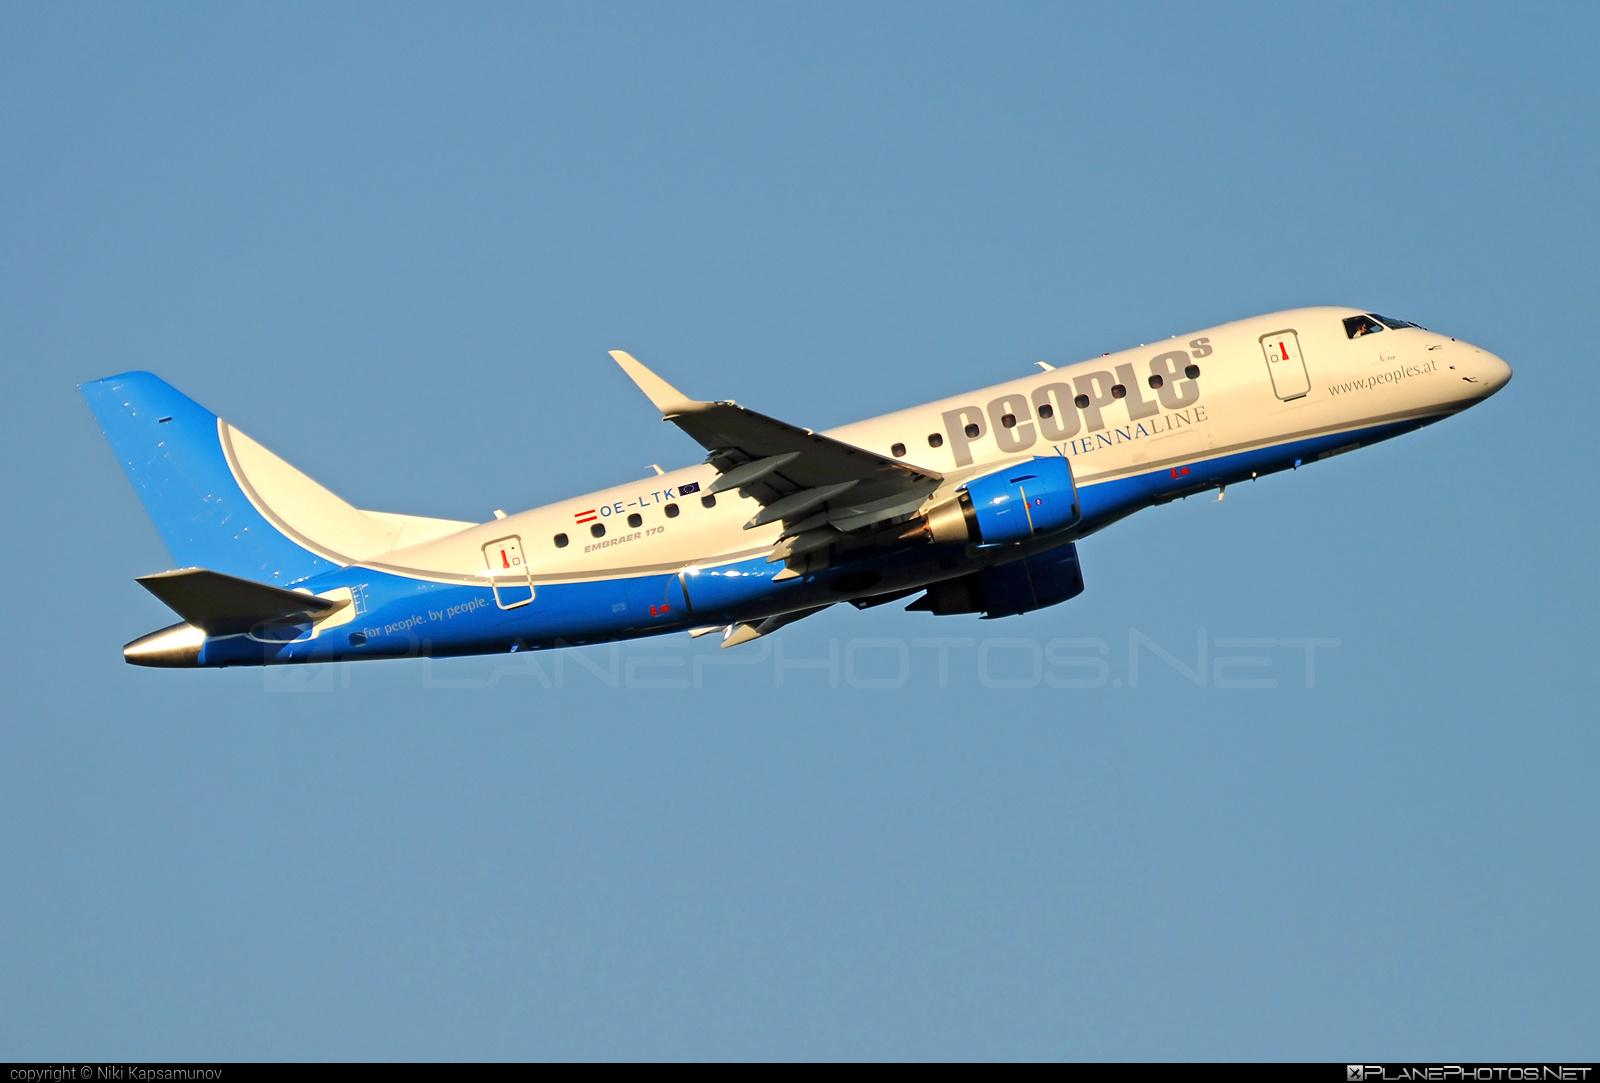 Embraer E170STD (ERJ-170-100STD) - OE-LTK operated by People`s Viennaline #e170 #embraer #embraer170 #embraer170std #erj170 #erj170100 #erj170100std #erj170std